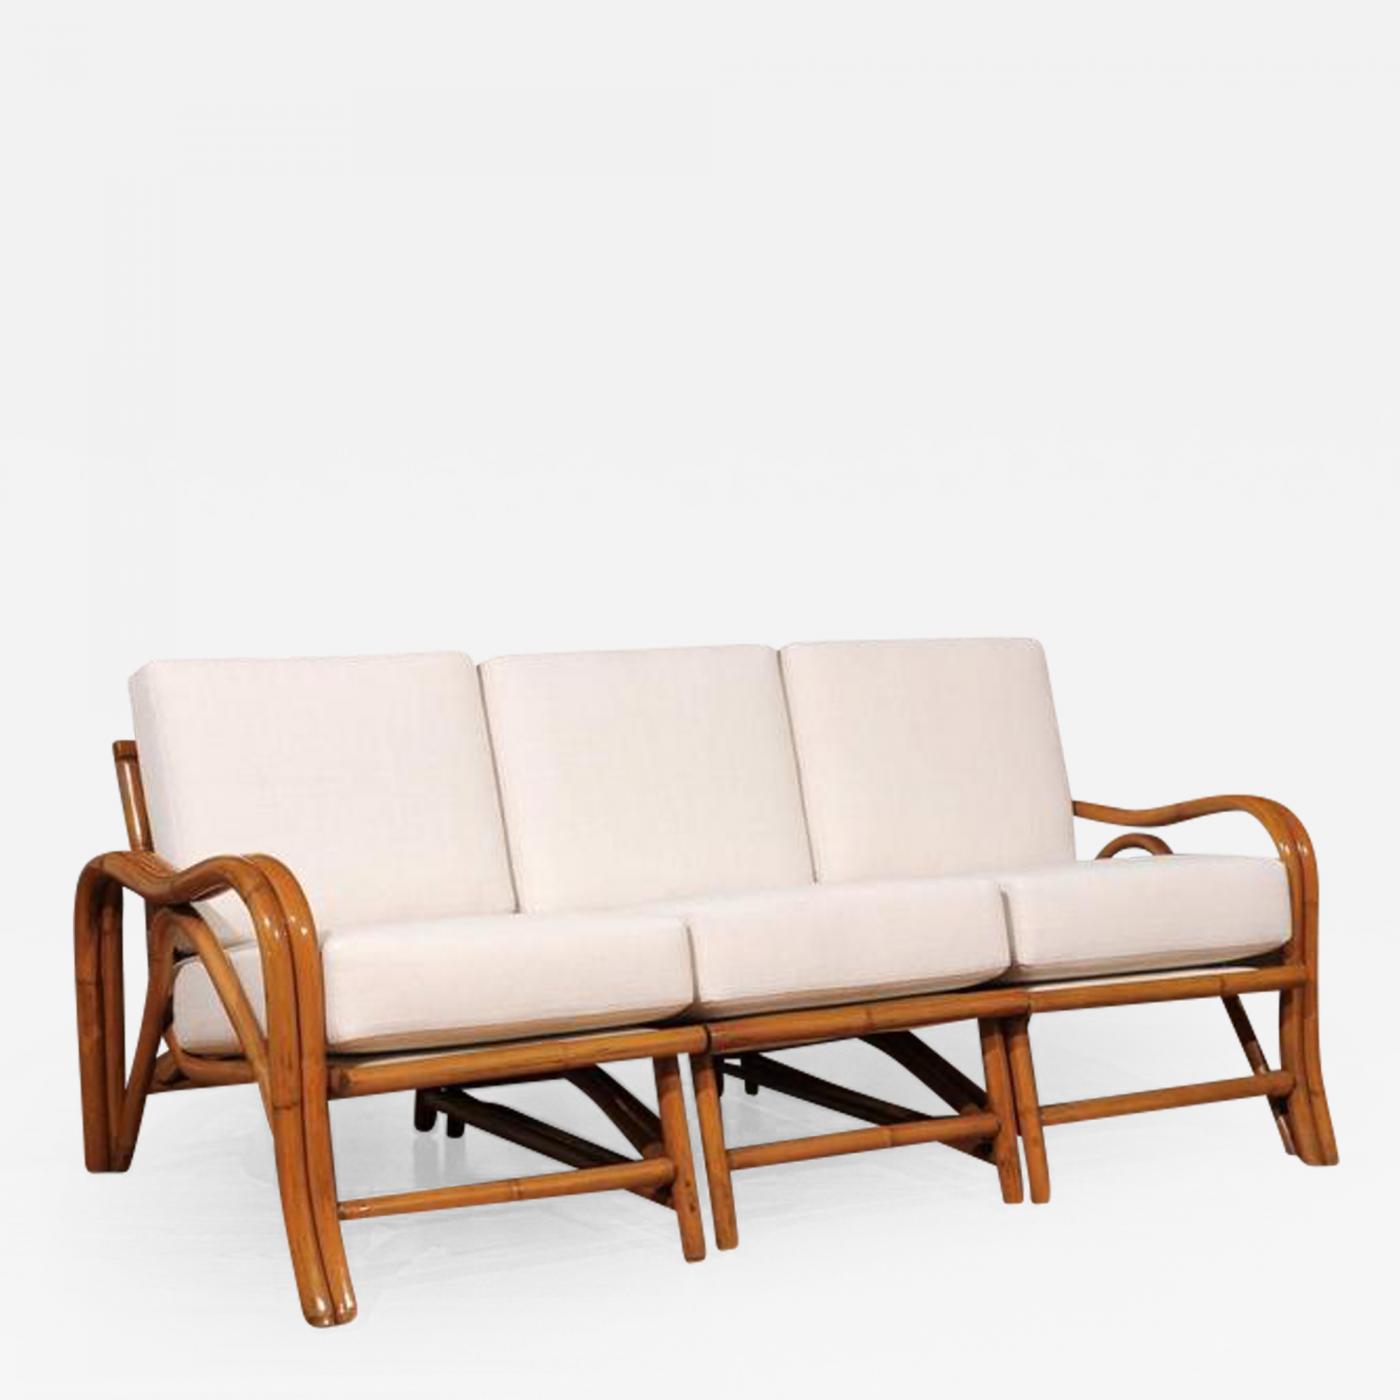 Fantastic restored vintage modern rattan three seat sofa for Modern rattan sofa